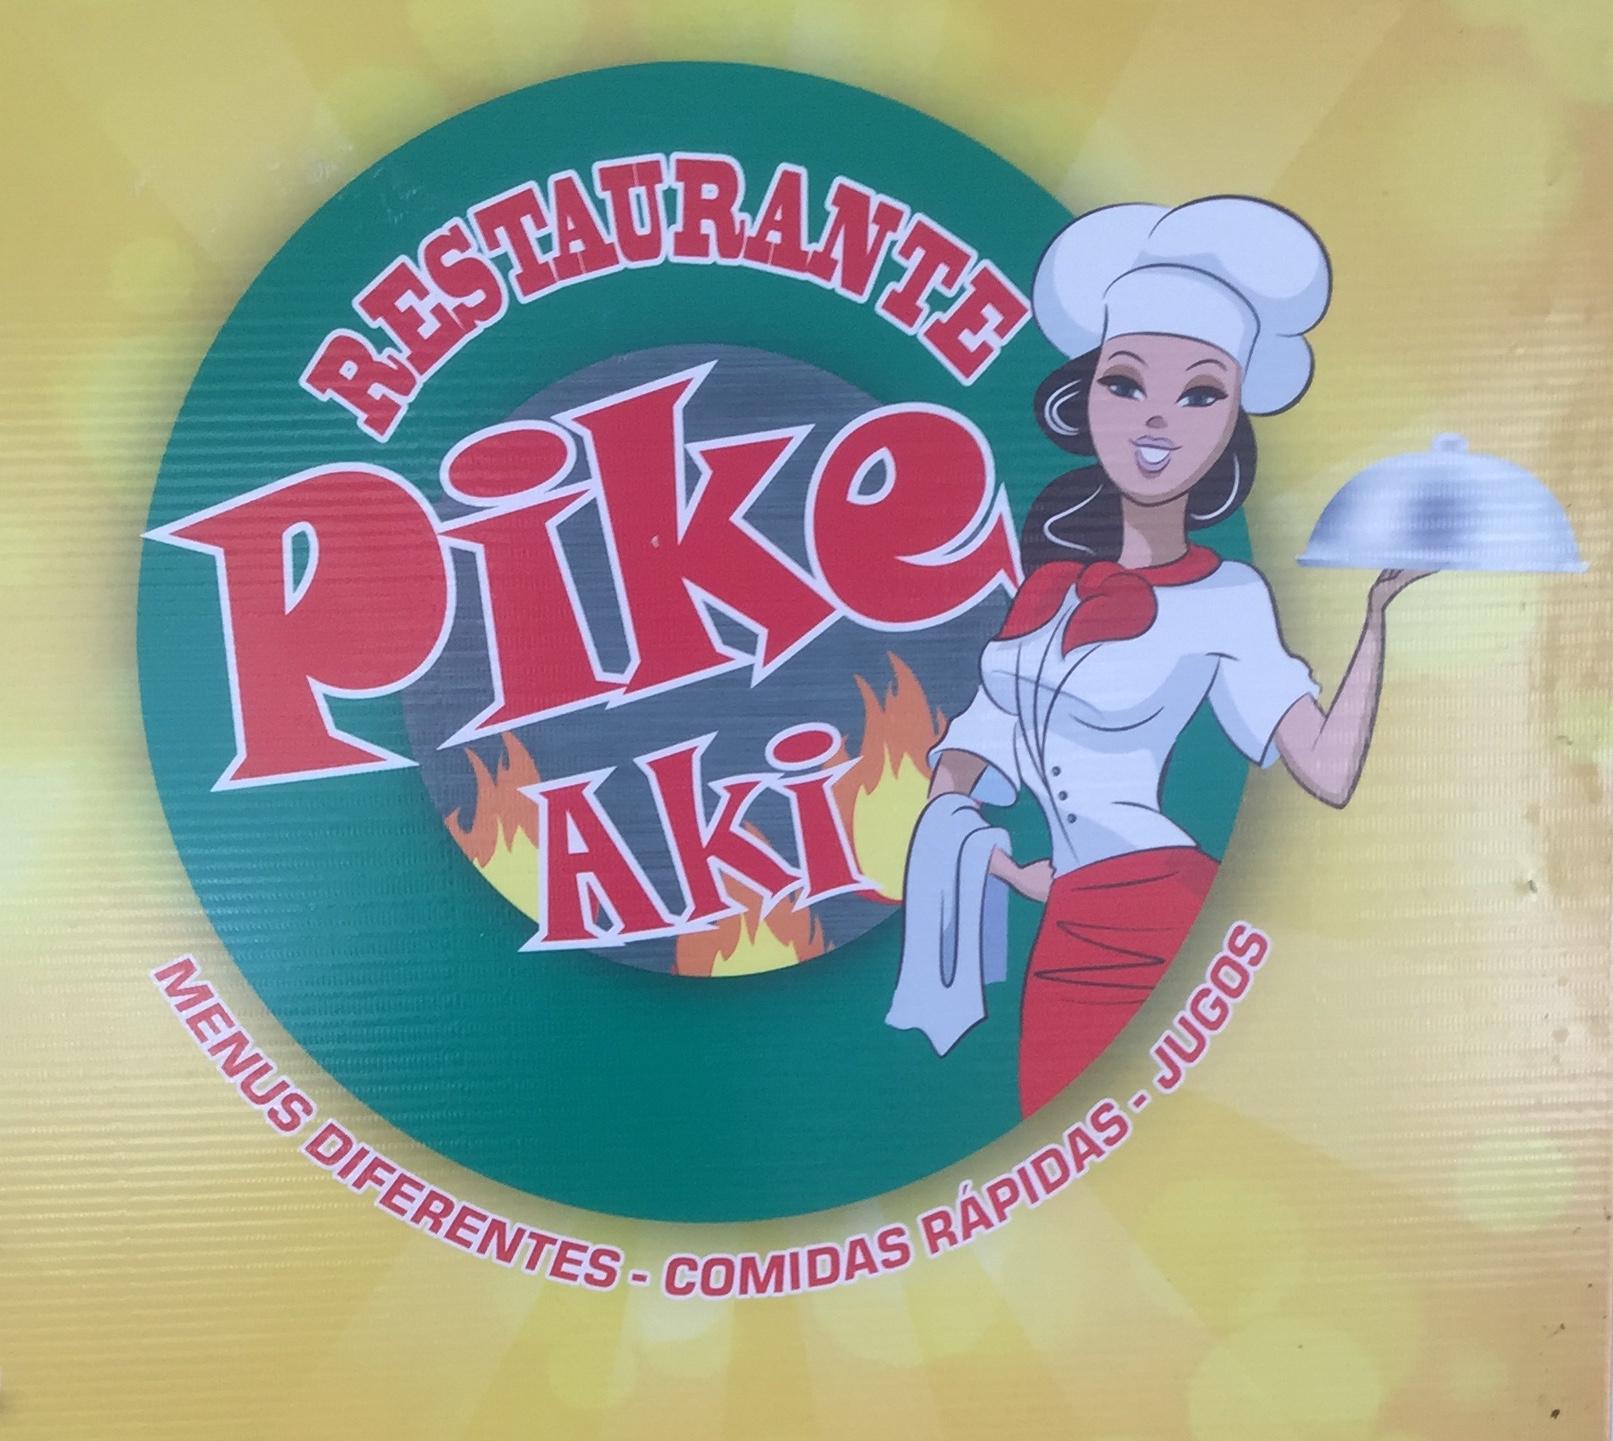 Pike Aki